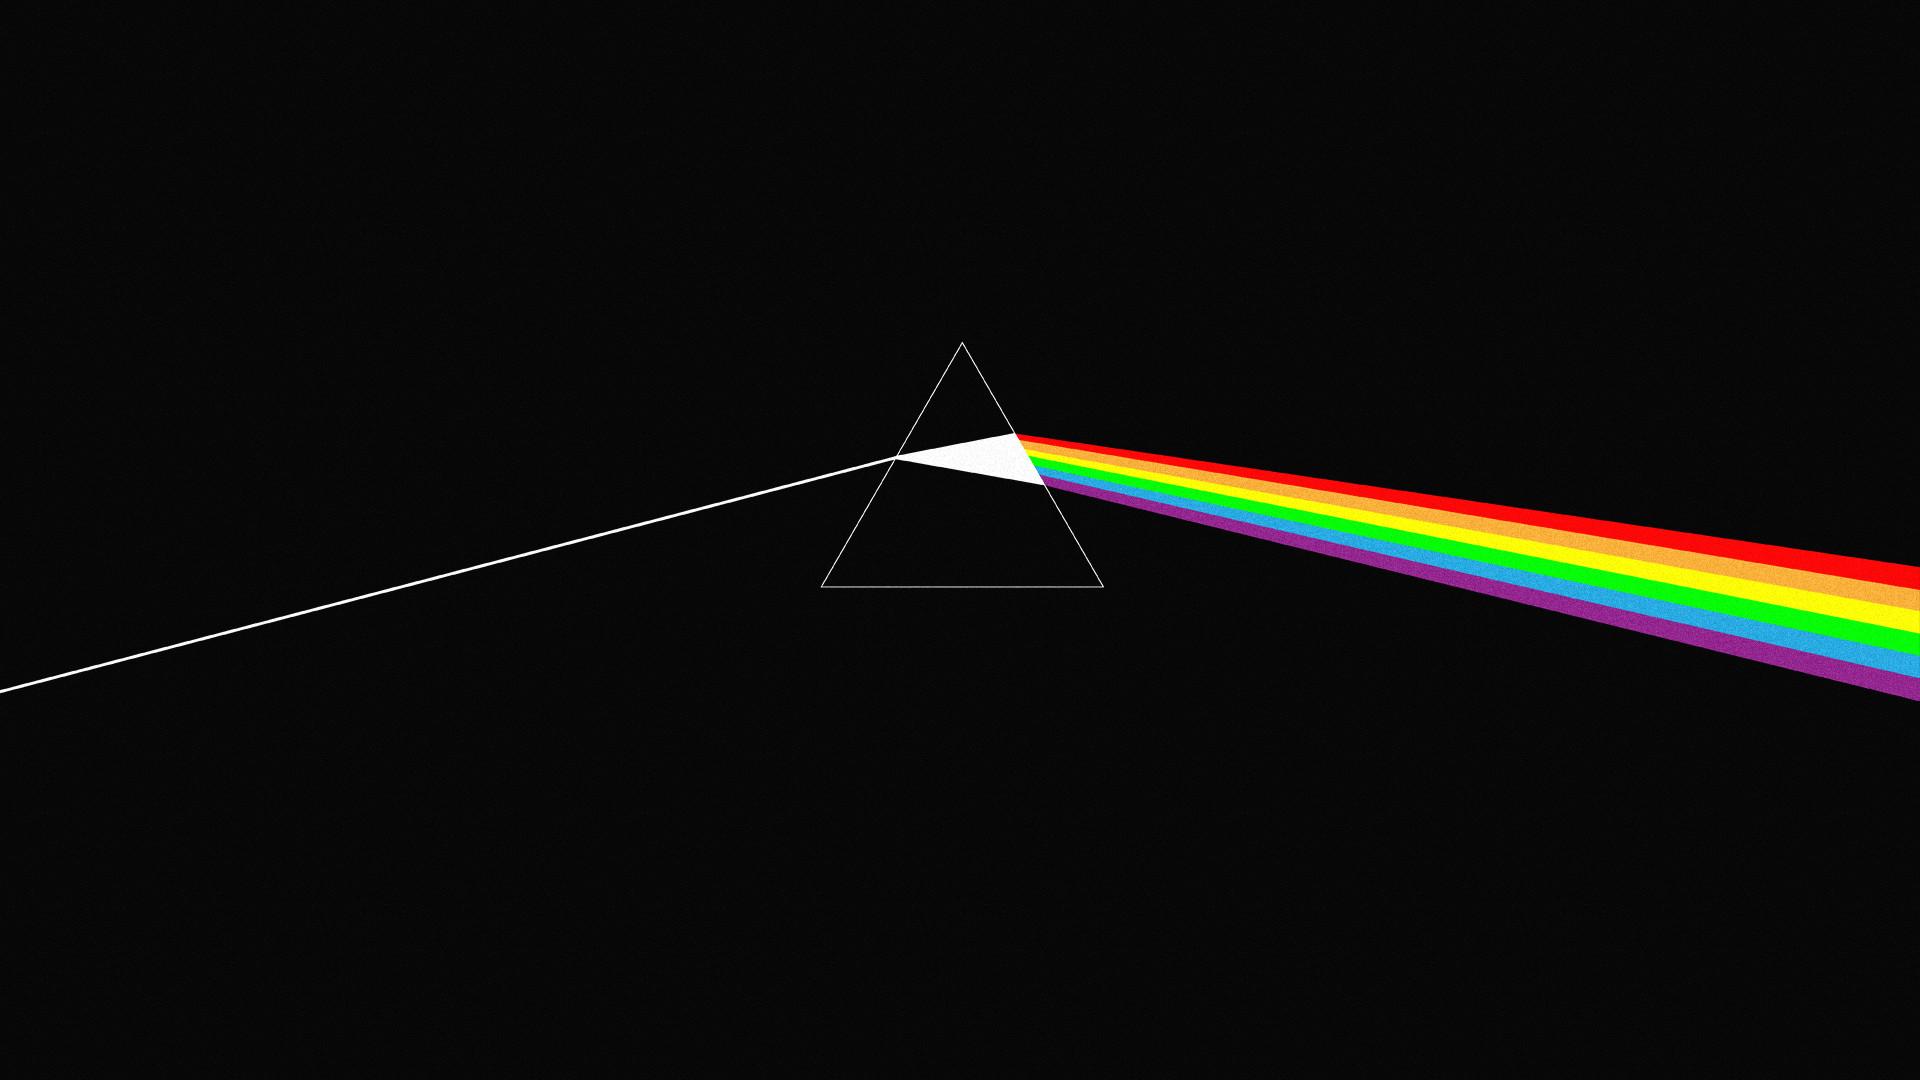 Pink Floyd Wallpapers Screensavers (74+ Images